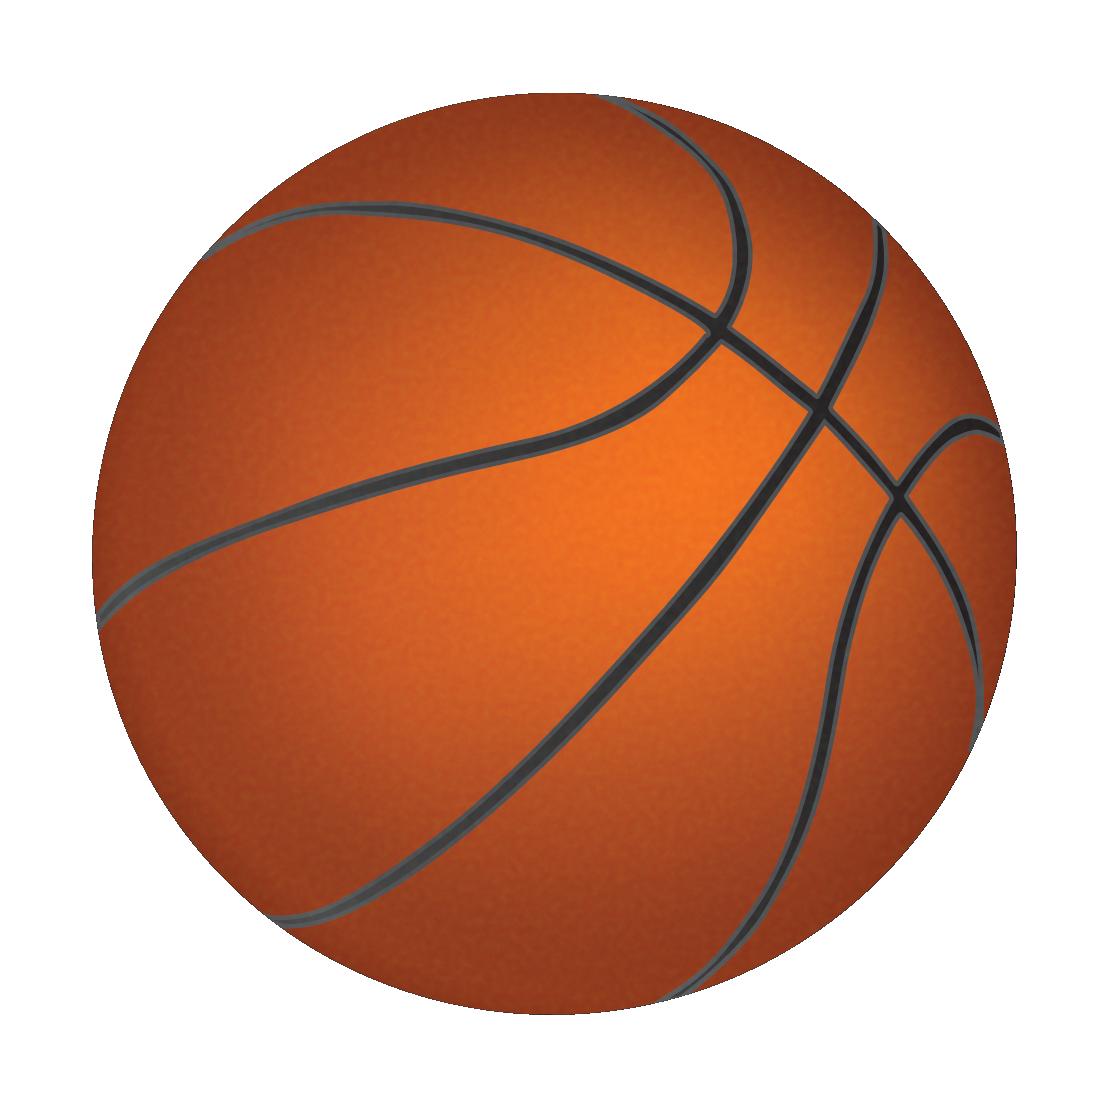 כדורסל פיינל פור